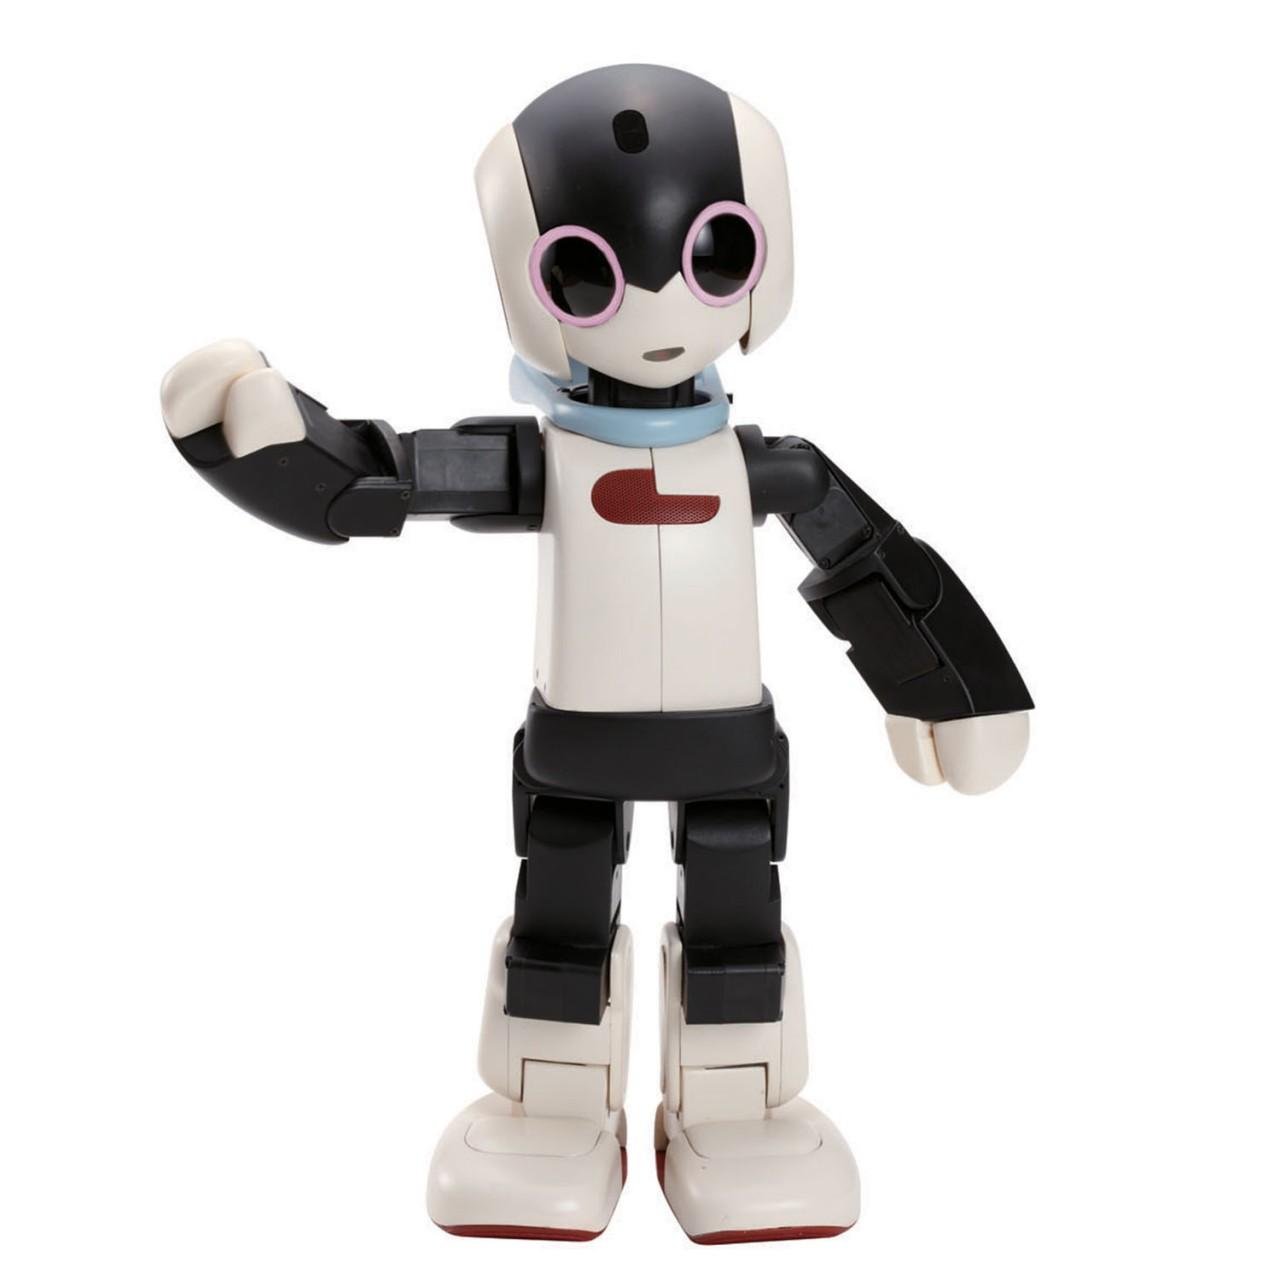 robot kit to build